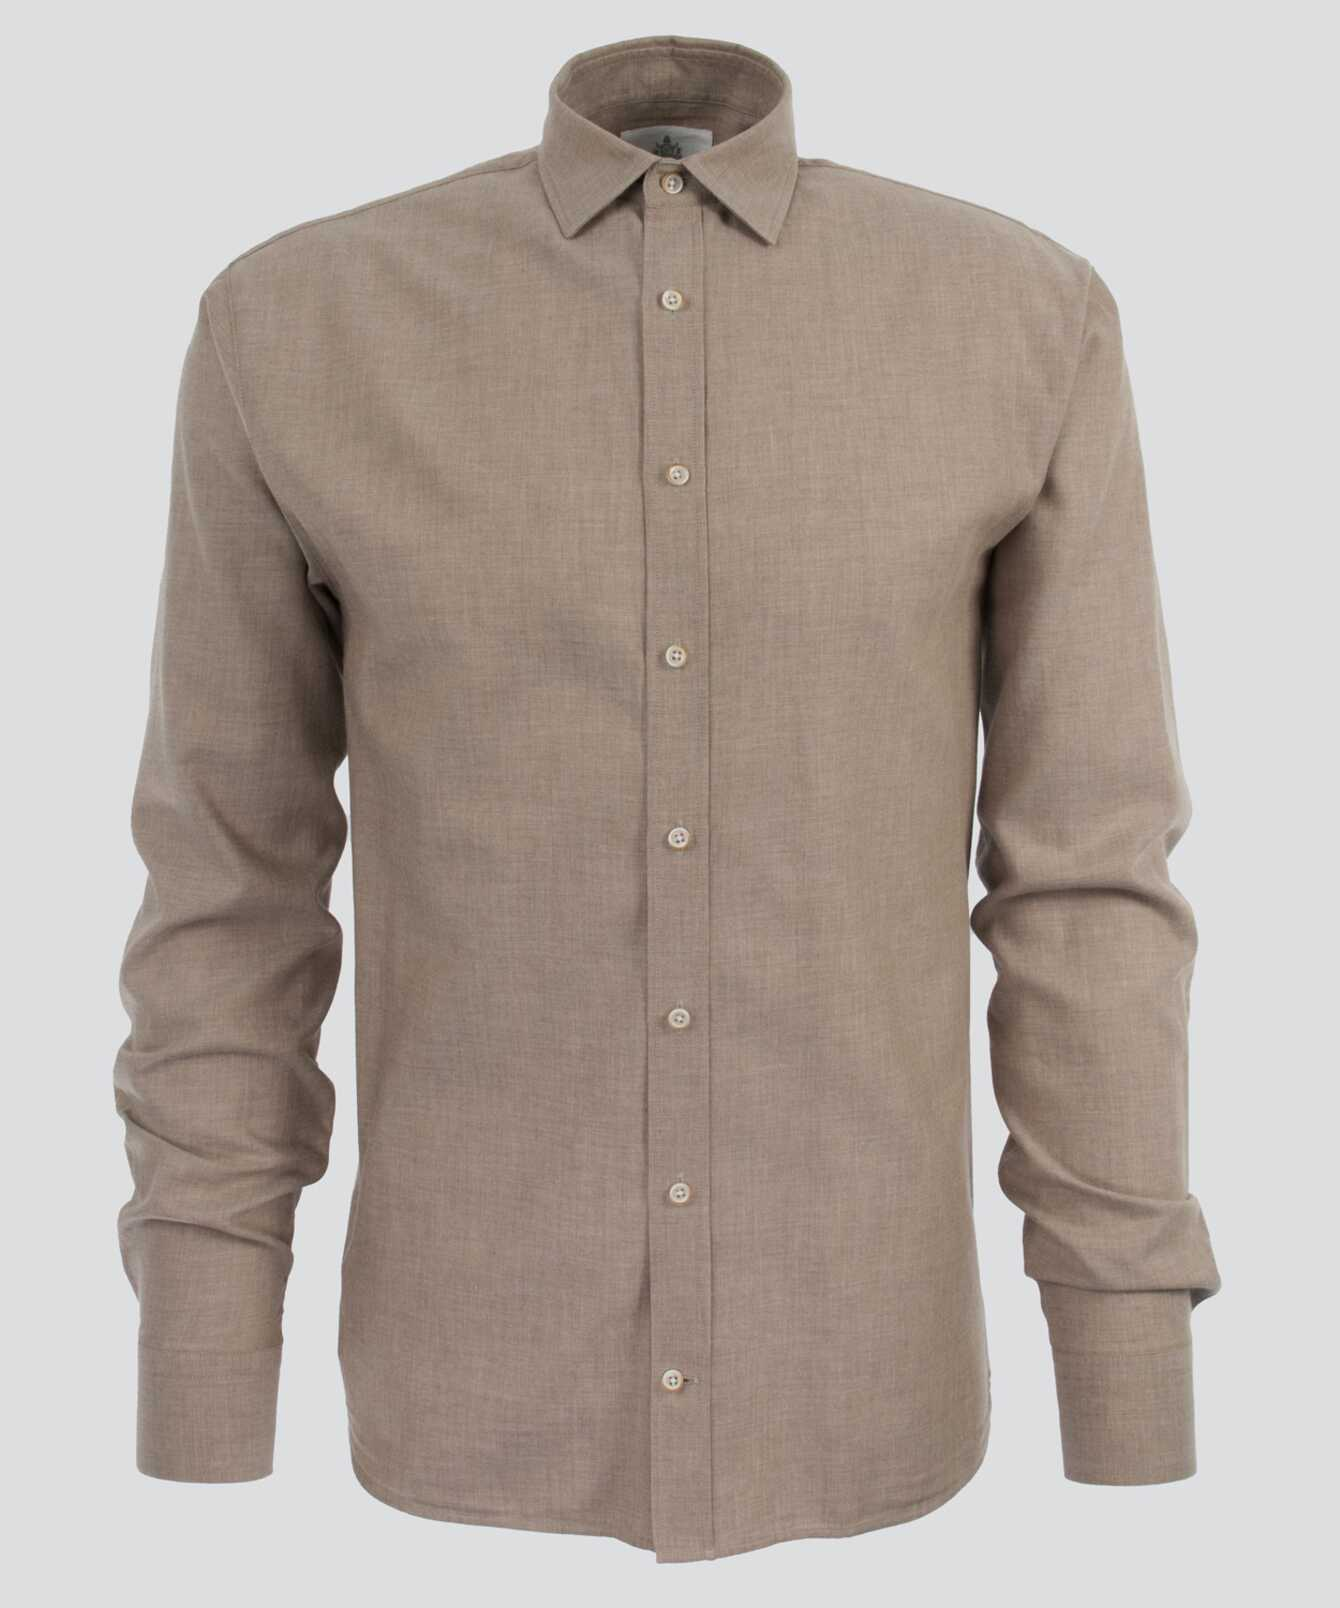 Shirt Costello Sand The Shirt Factory